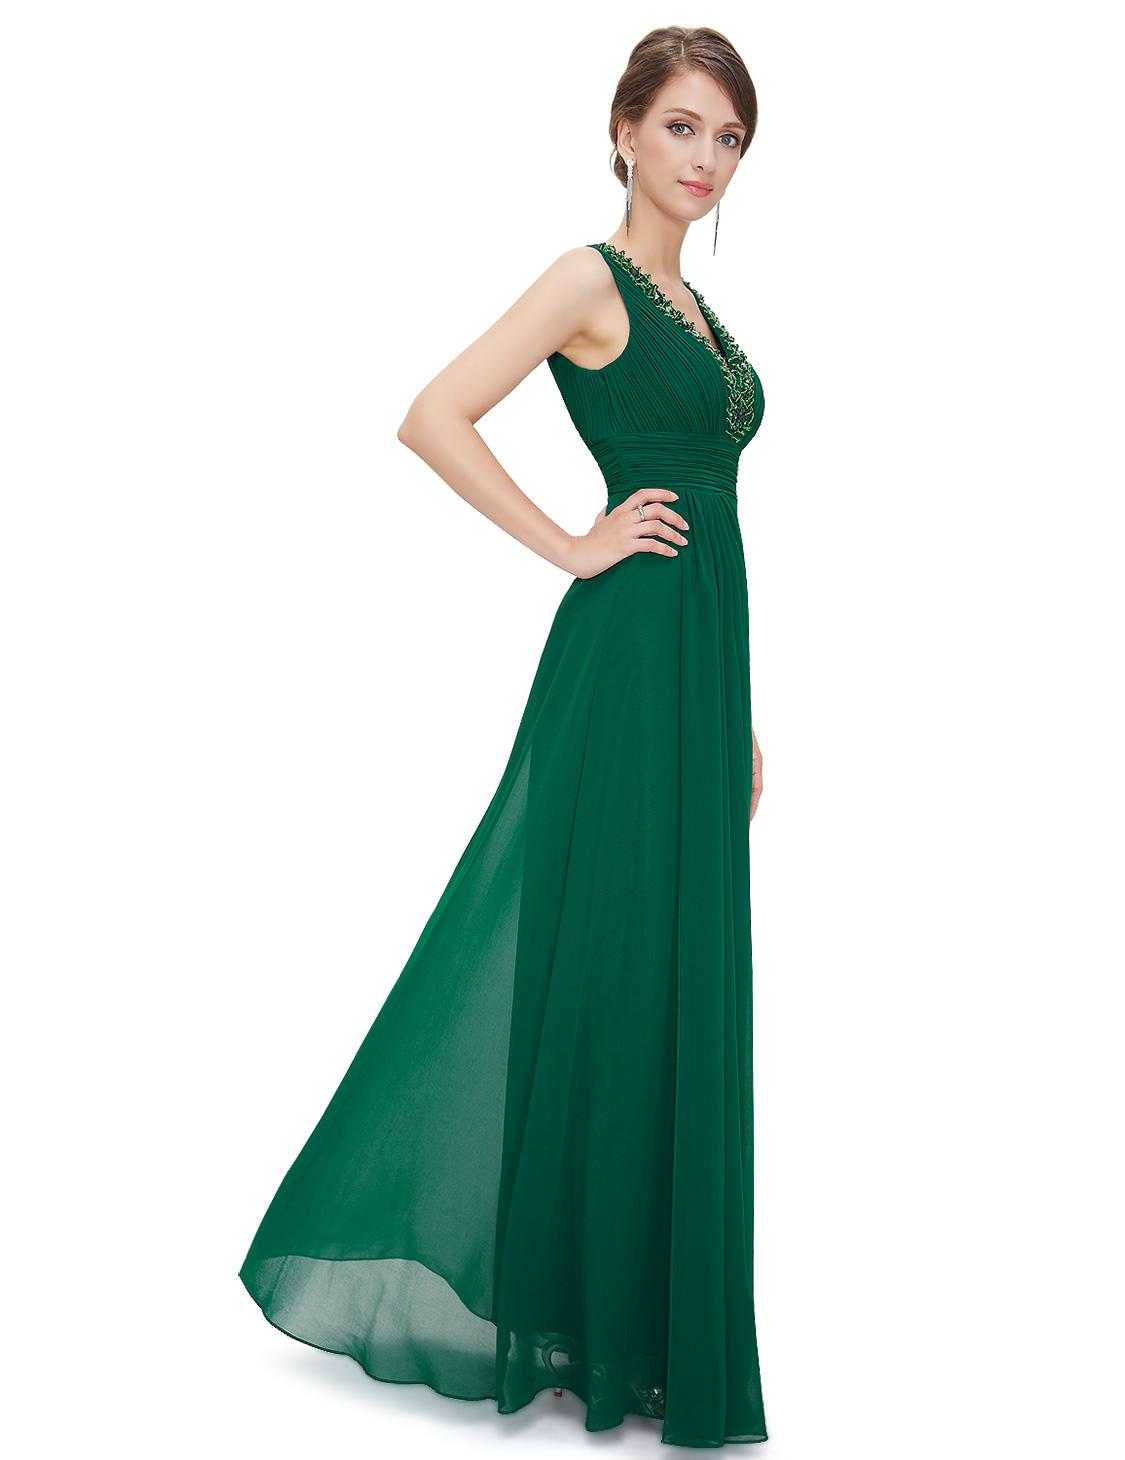 Purple bridesmaid dresses ebay discount wedding dresses for Cheap wedding dresses ebay